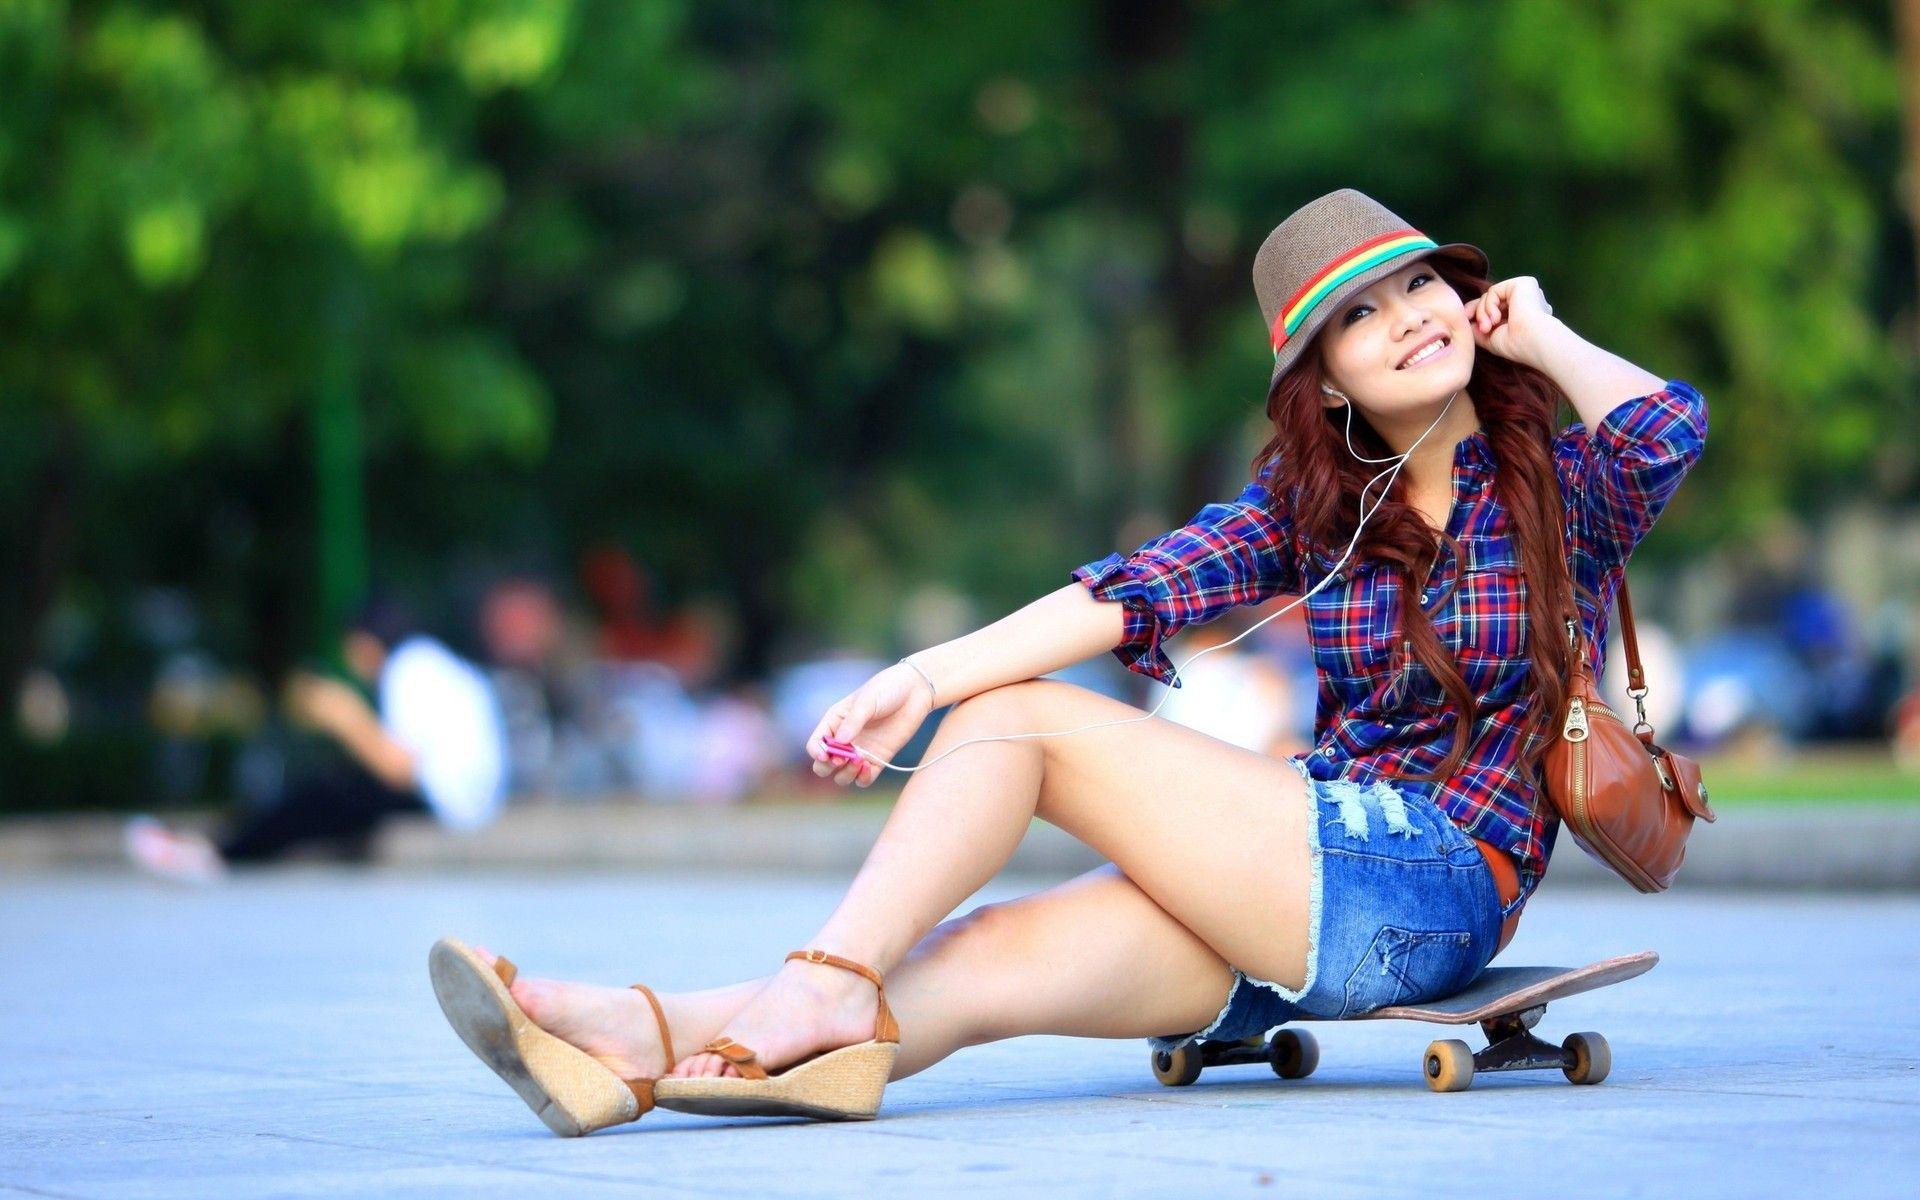 Cute Asian Girl Wallpapers Full HD Free Download